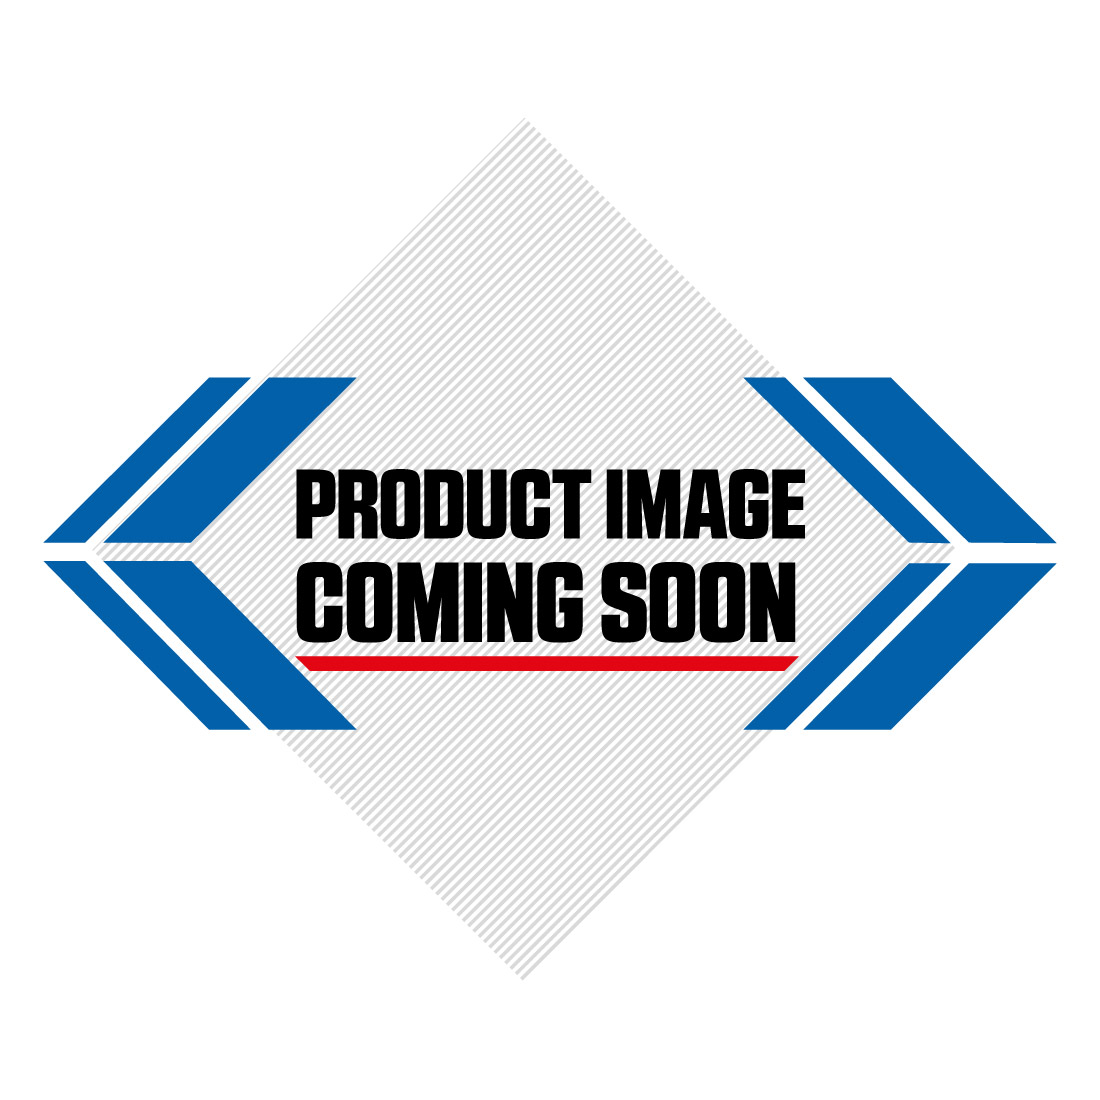 UFO KTM Plastic Kit SX 125 150 250 SXF 250 350 450 (16-18) White Image-1>